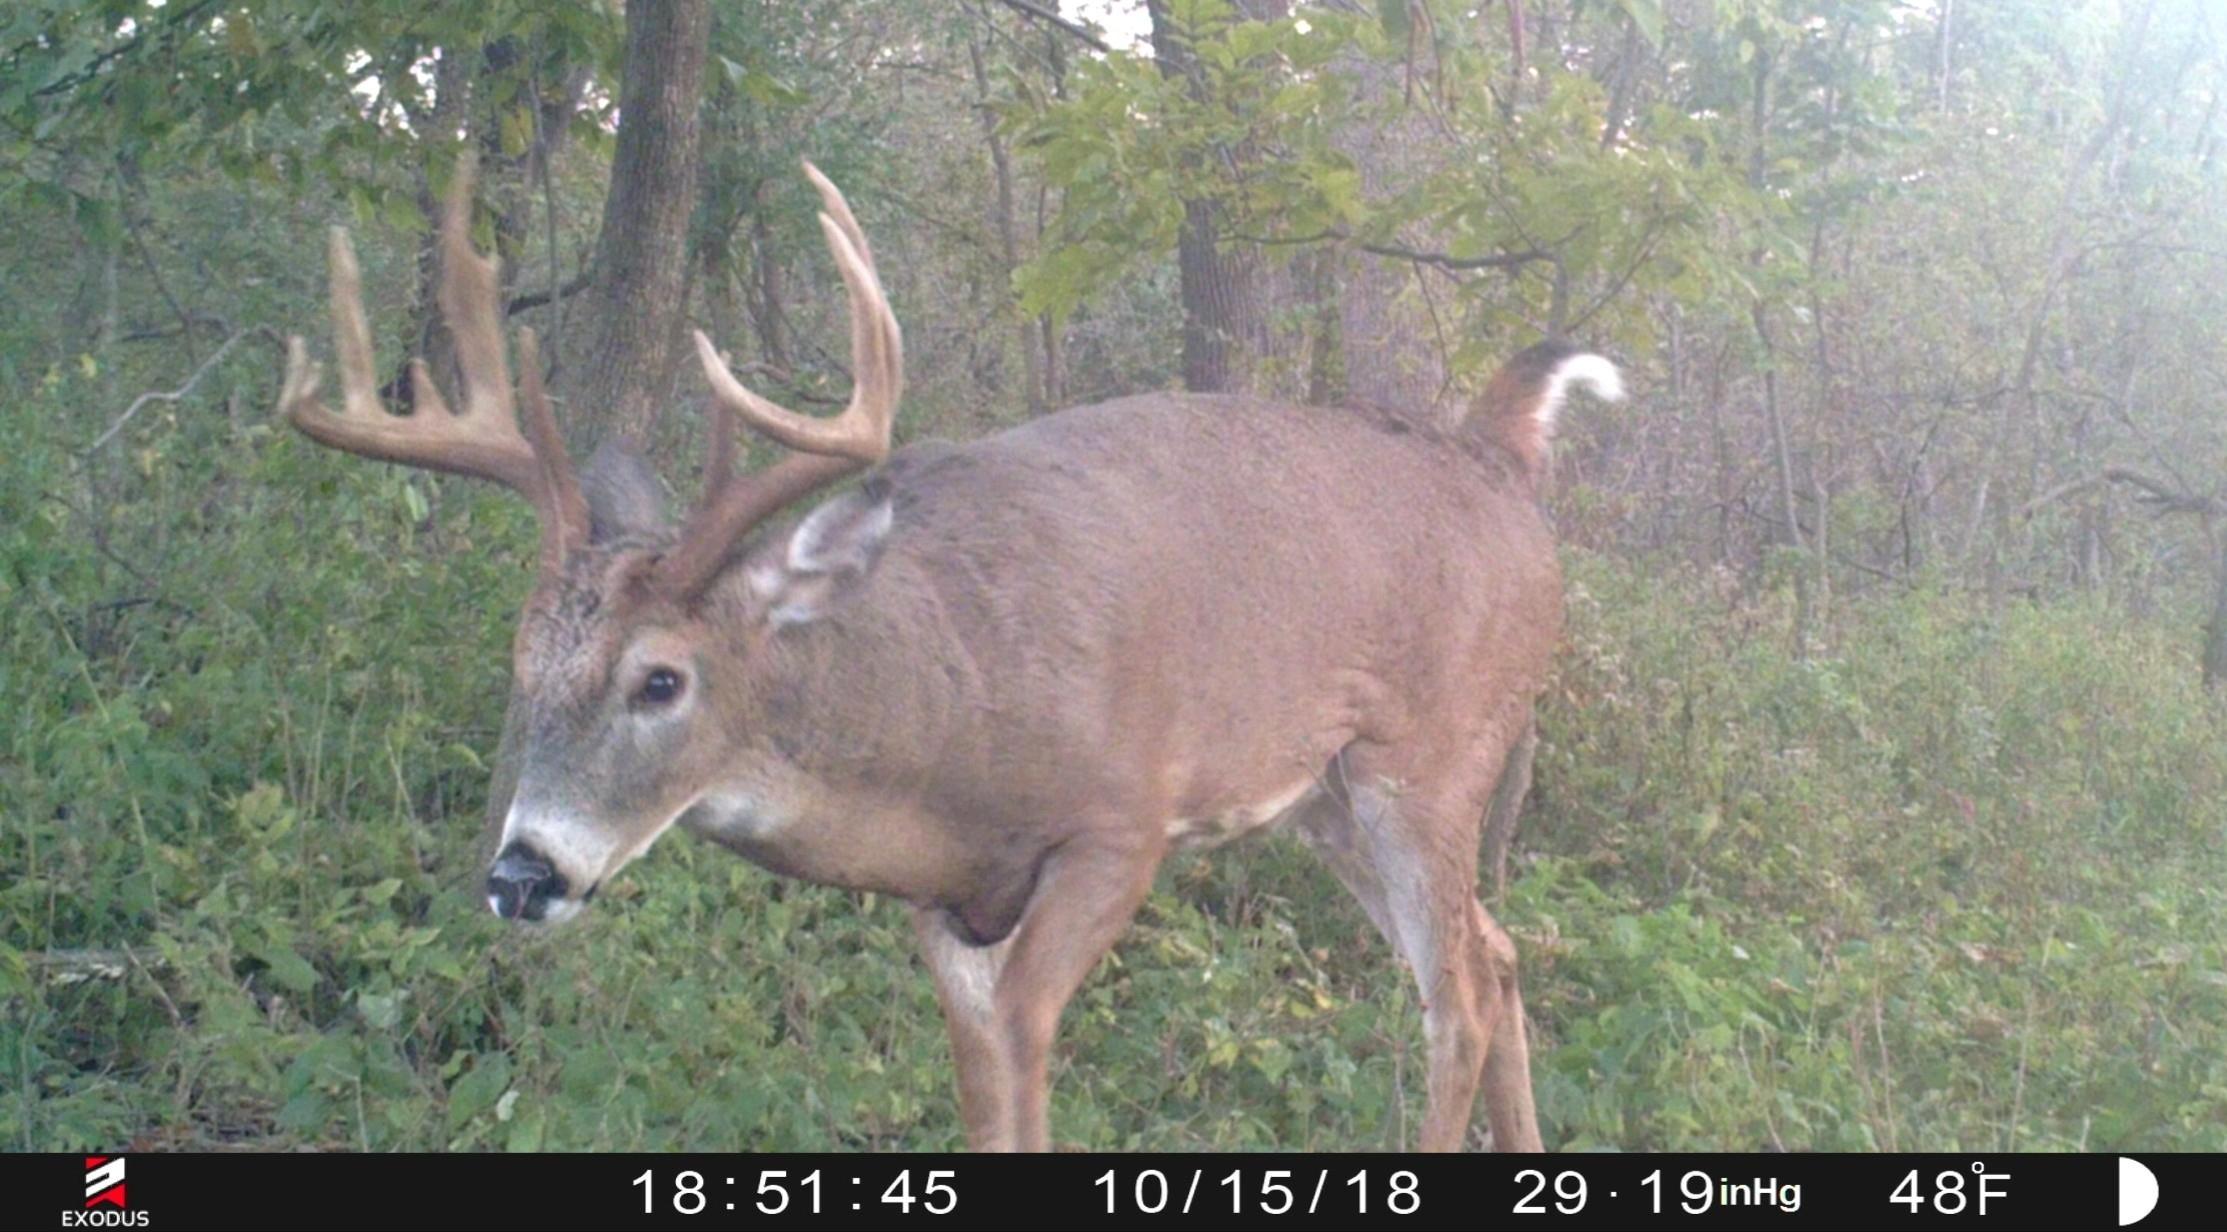 Nj Deer Rut Forcast 2021 - Template Calendar Design regarding Deer Rut 2021 Illinois